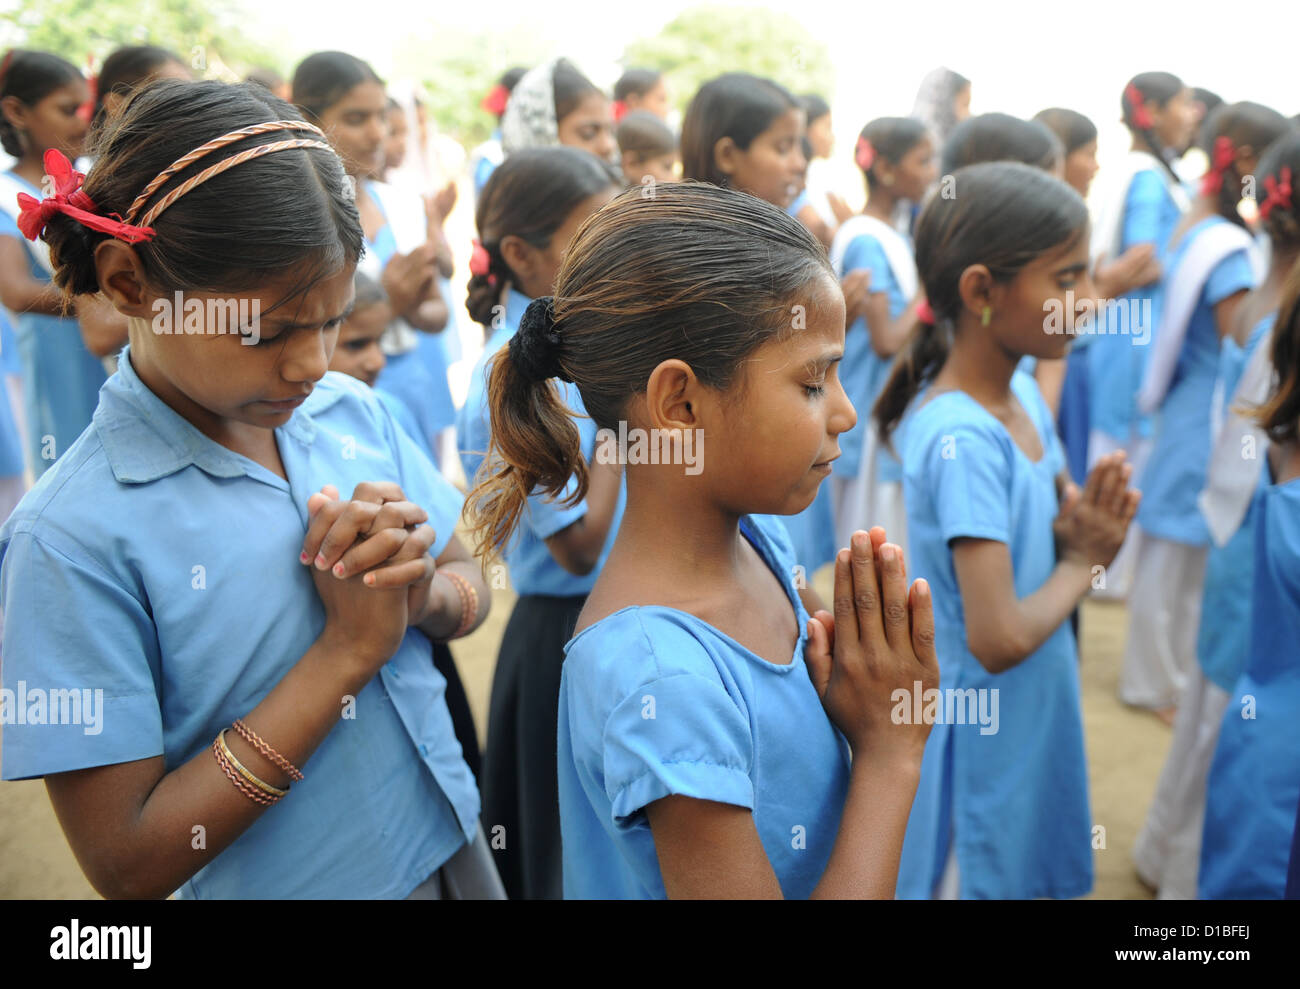 Students pray before the classes start at the girls' school in Mundia near Jaipur, India, 19 November 2012. - Stock Image